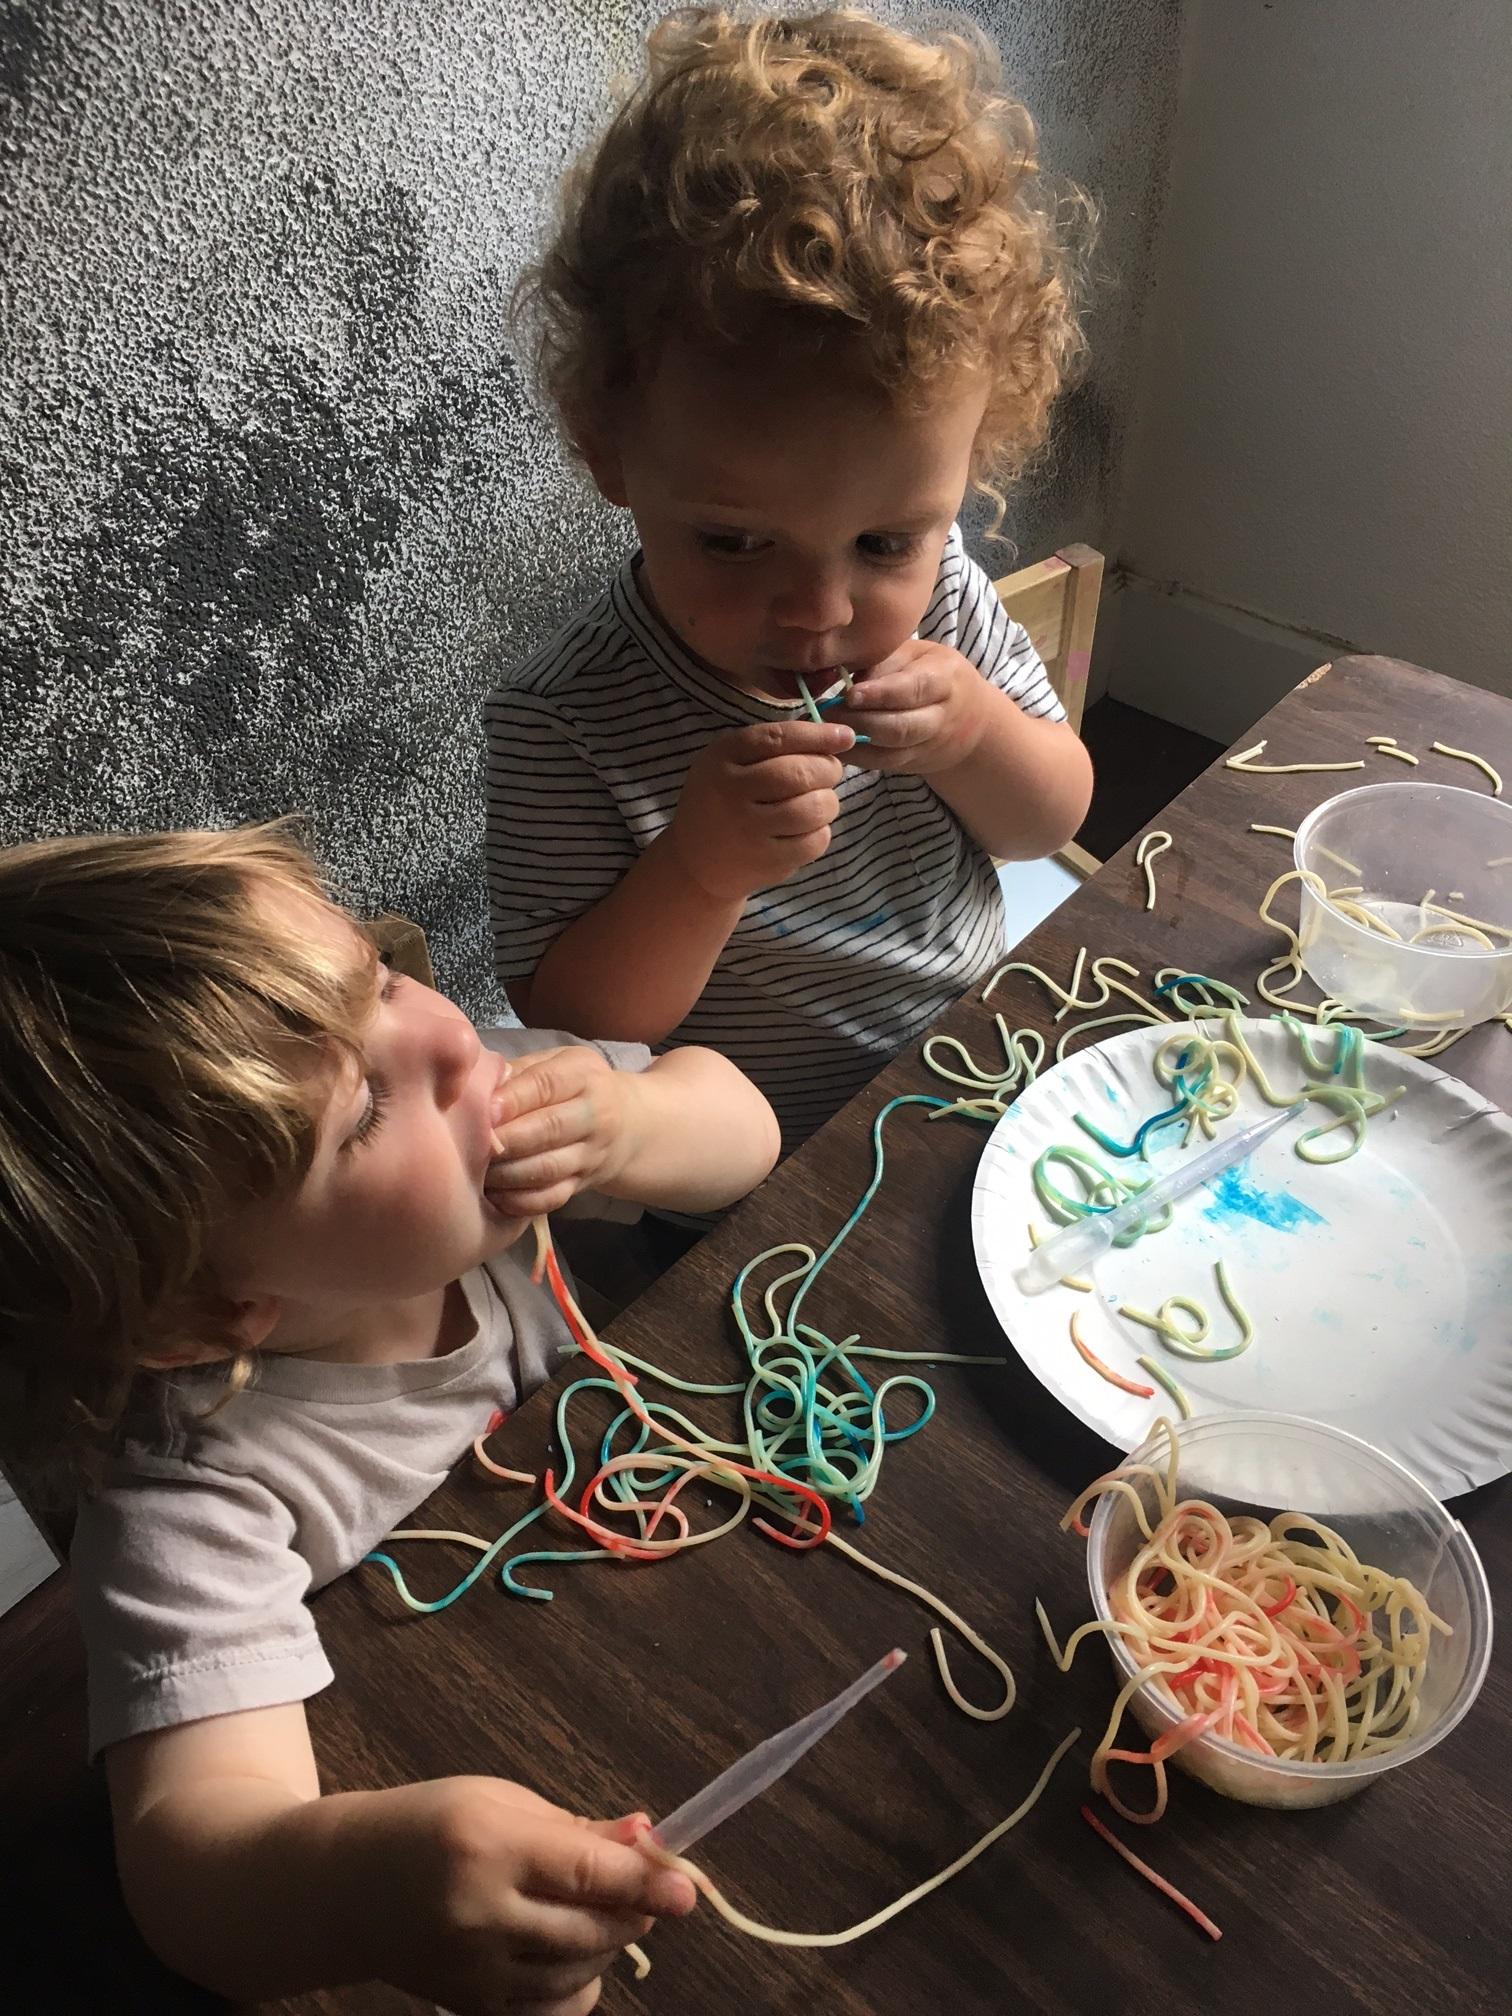 Spaghetti Worms